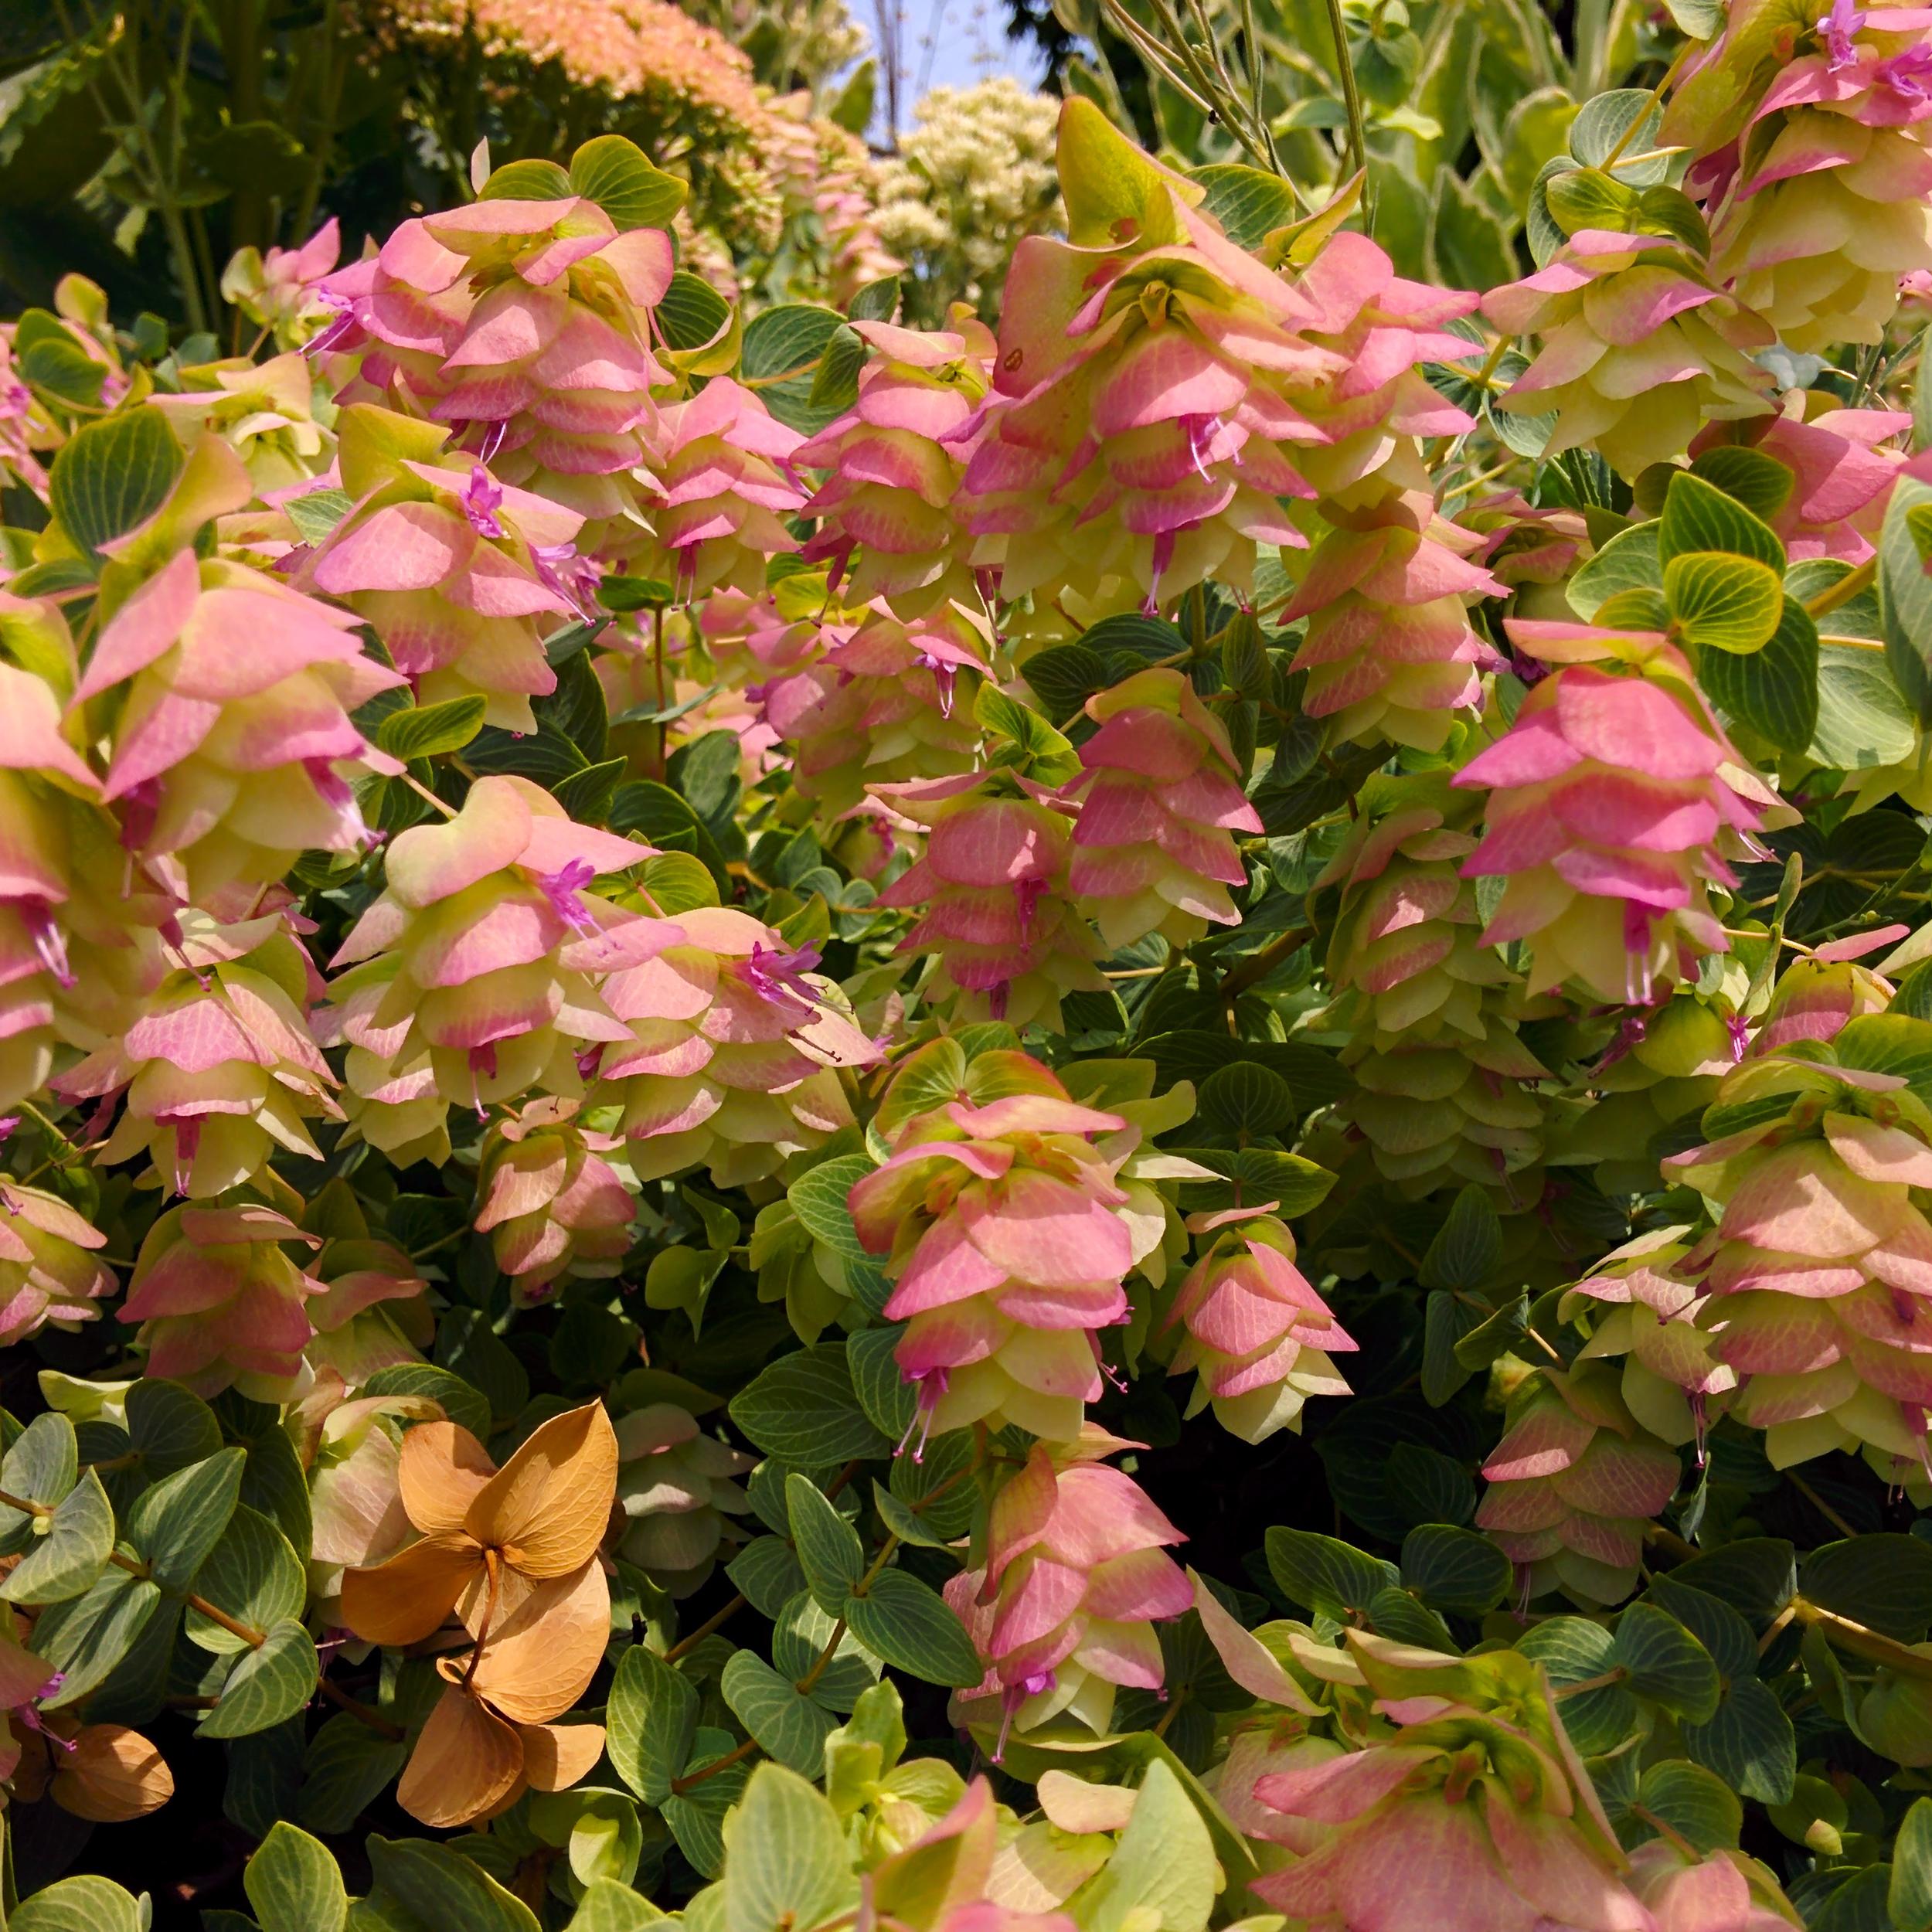 Dangling Pink Flowers